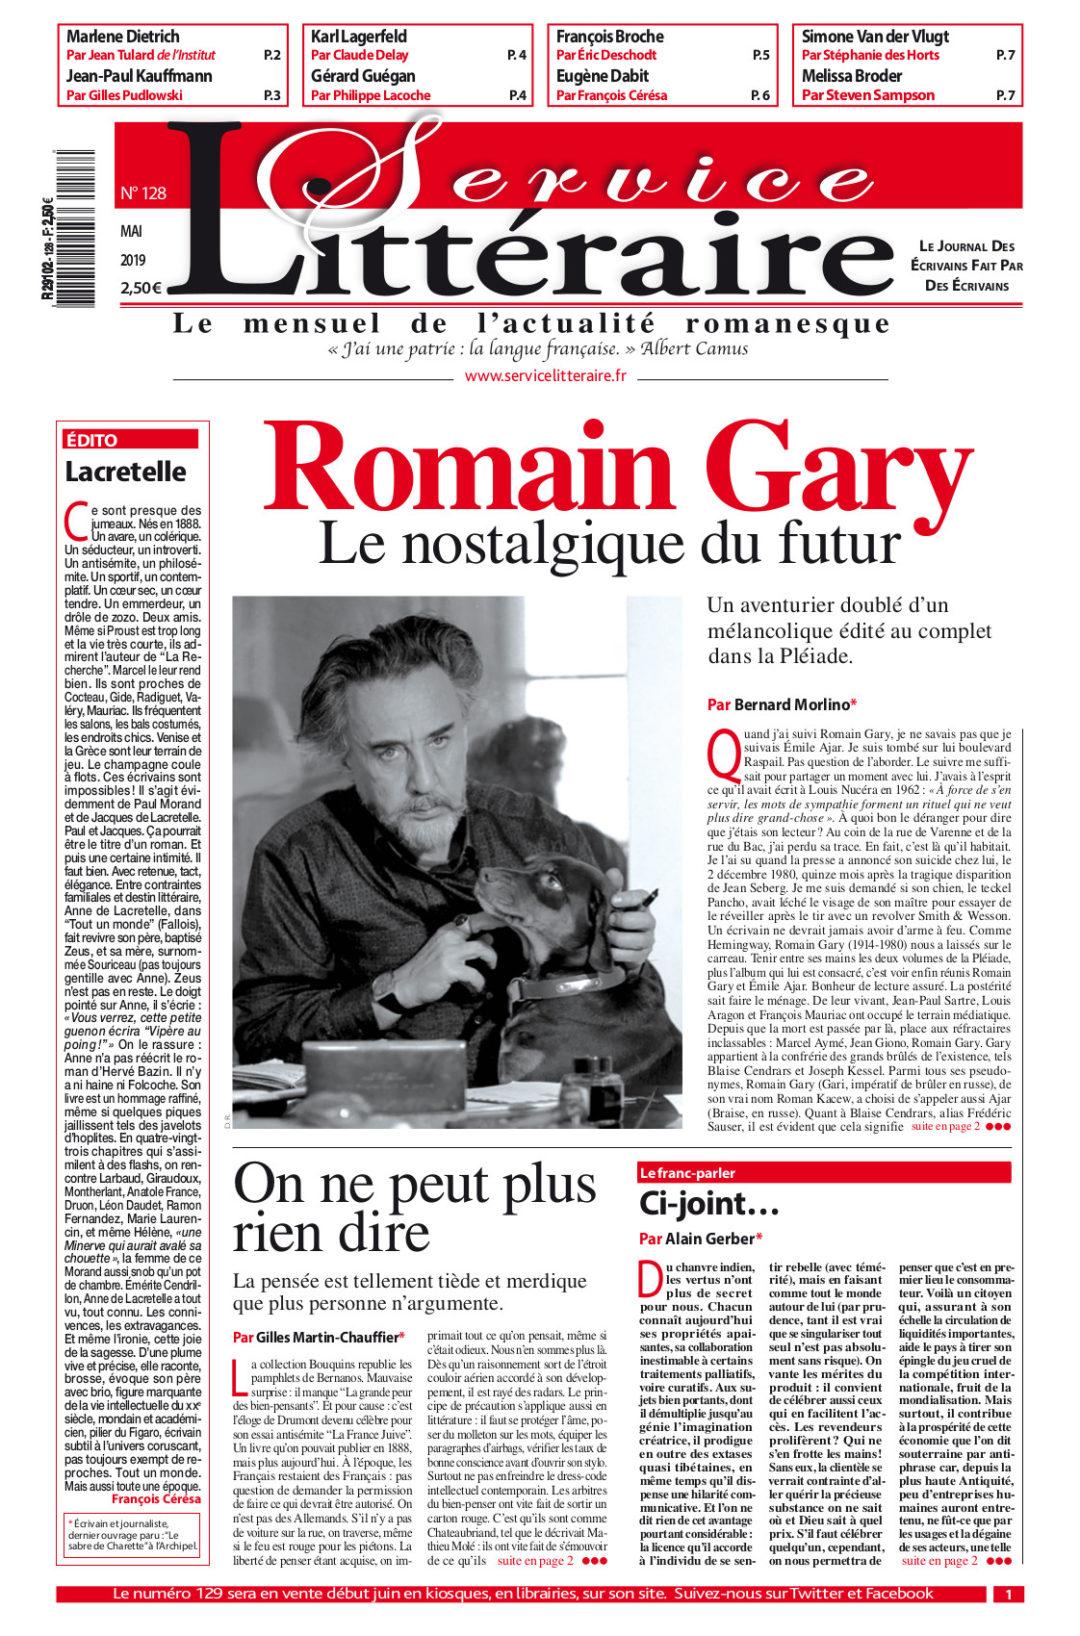 Romain Gary SL 128 Mai 2019